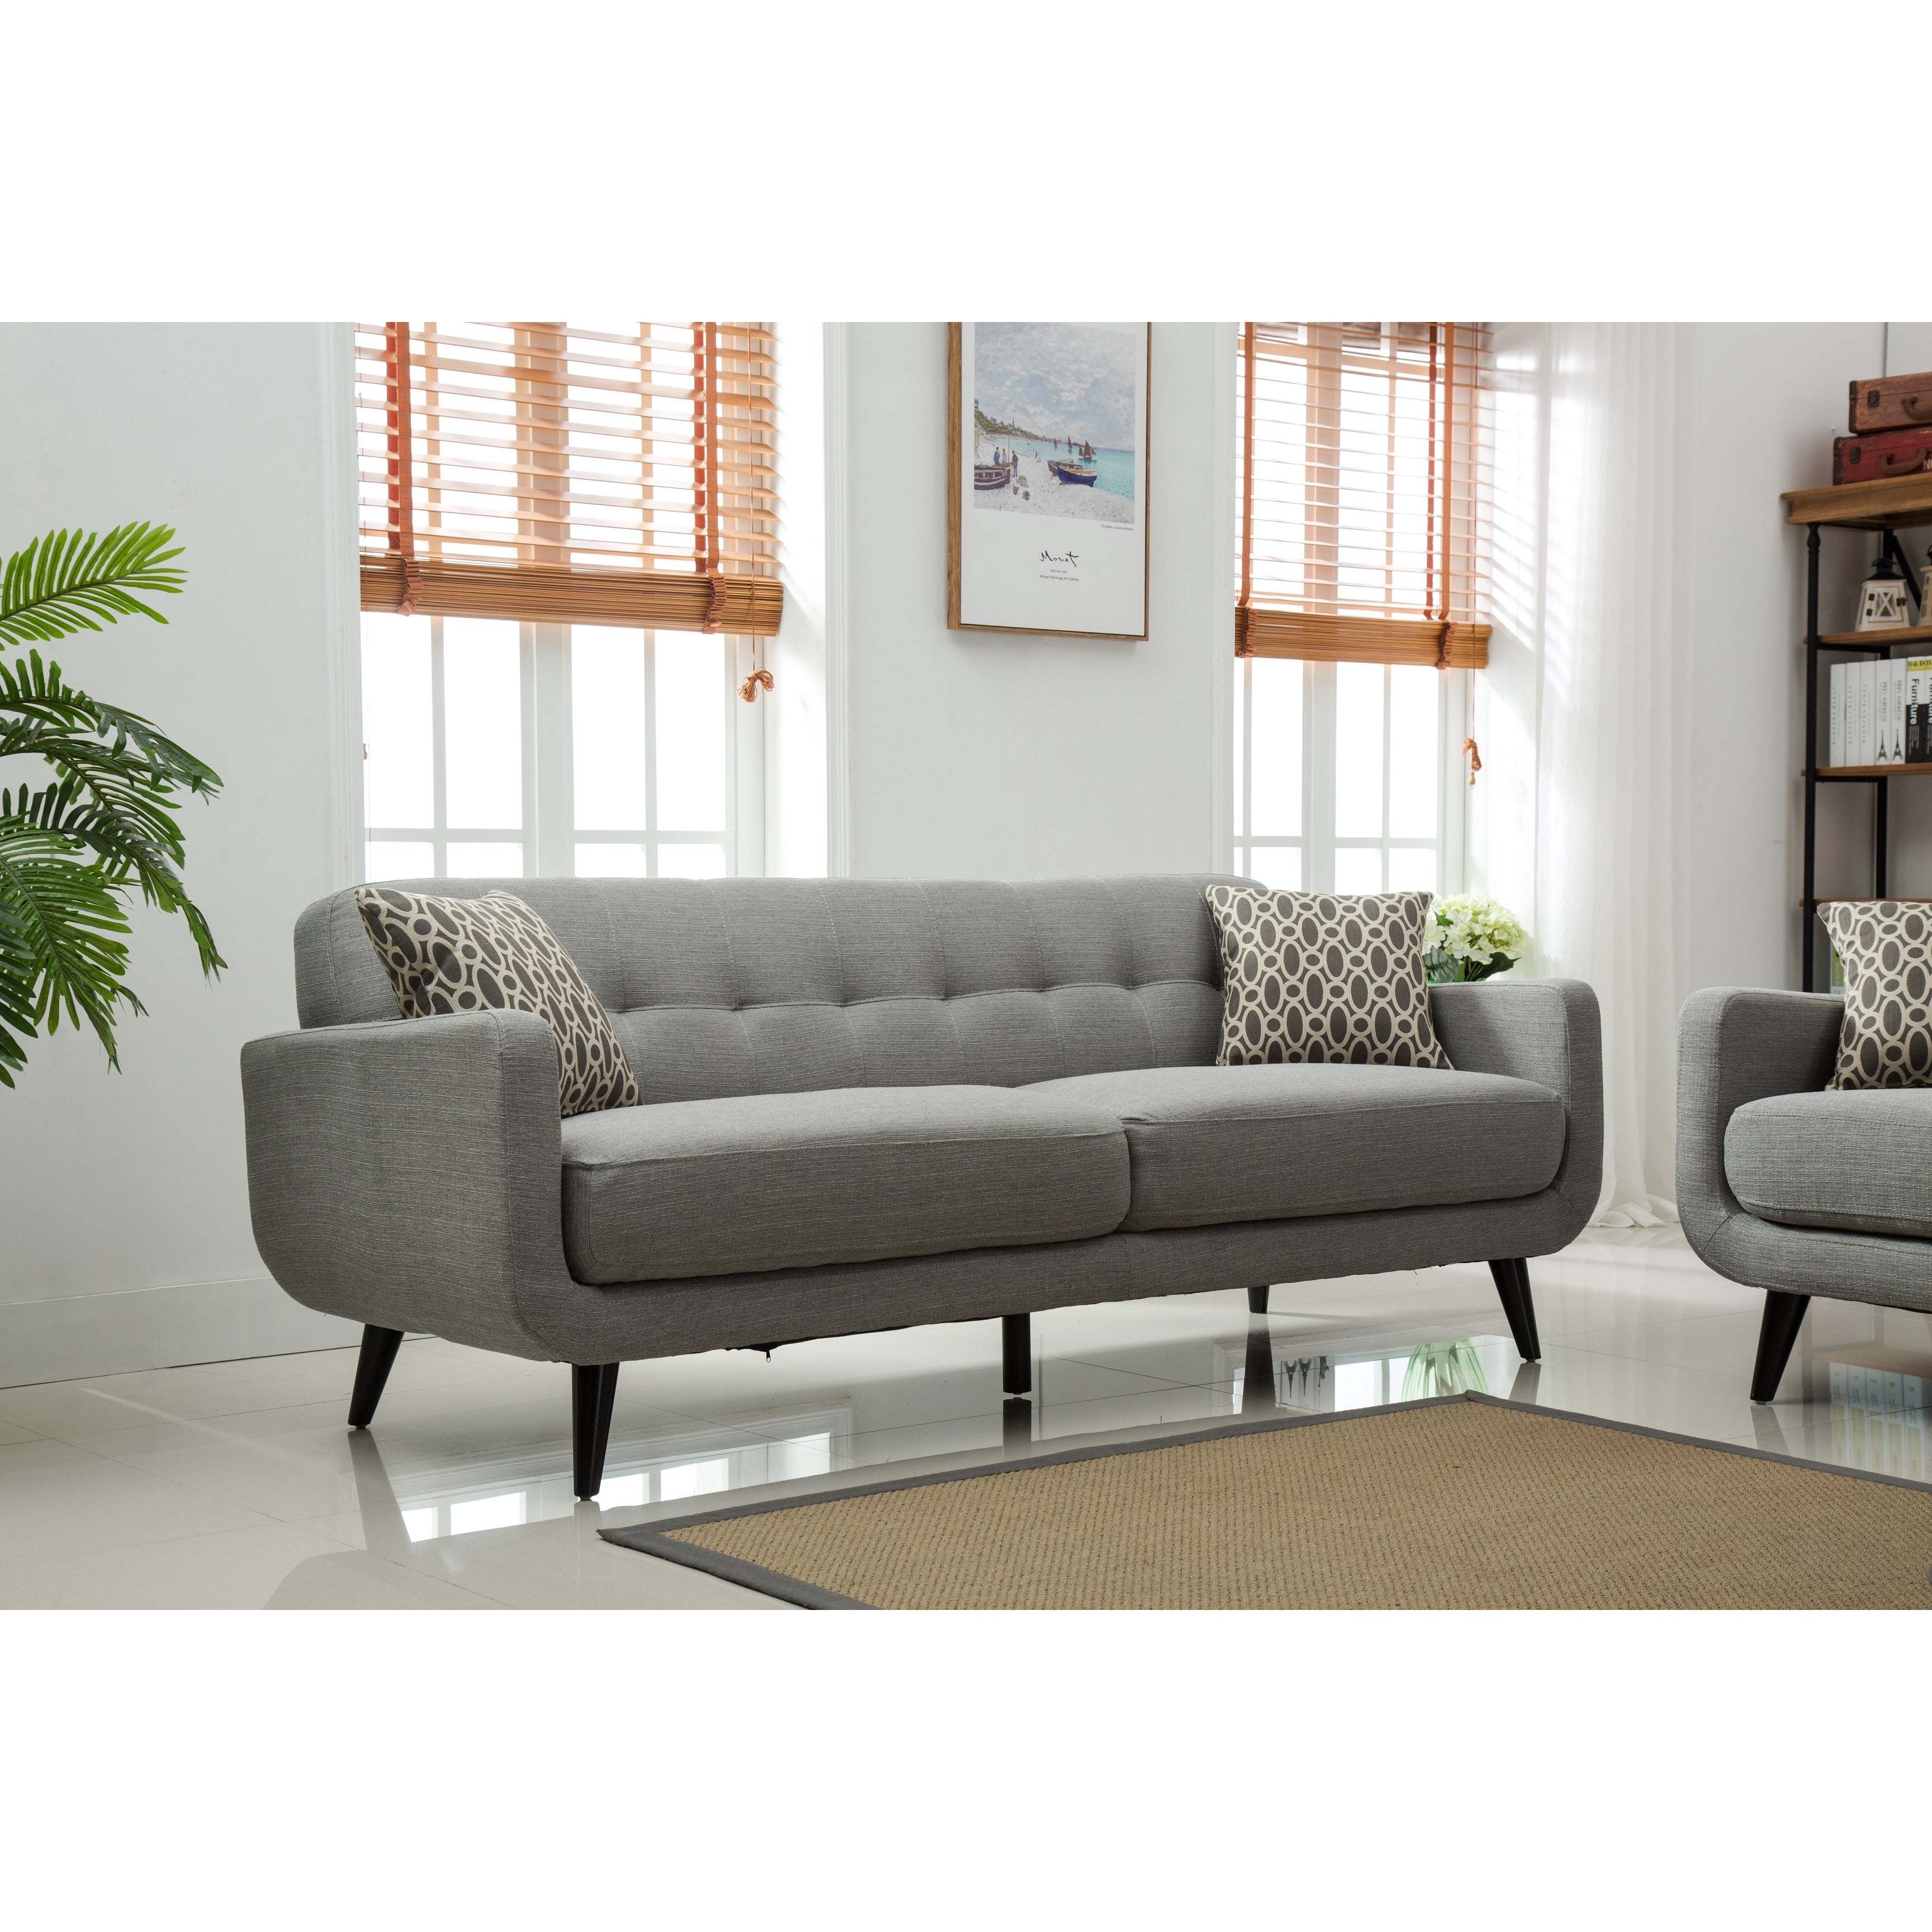 Modibella Contemporary Tufted 2-Piece Sofa and Loveseat Set - Free ...